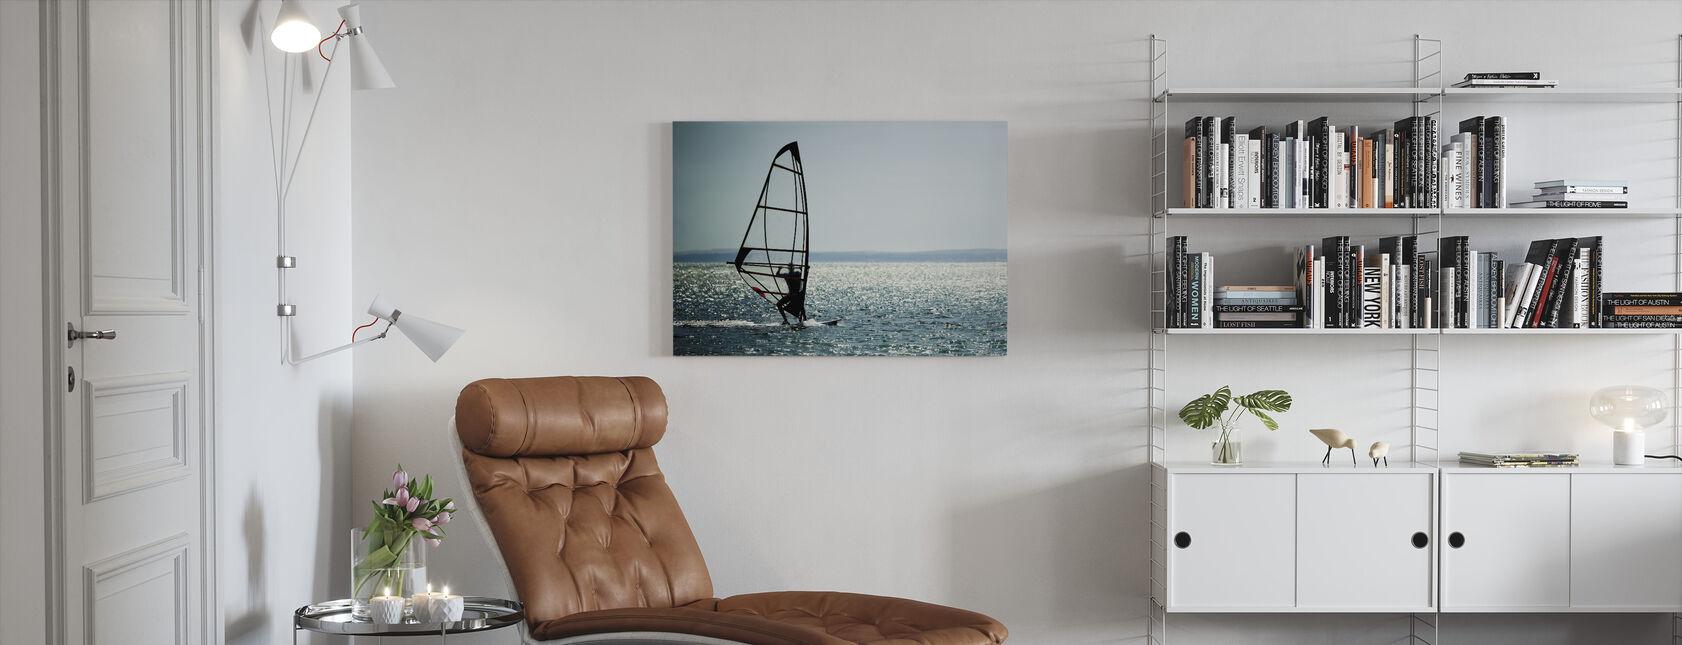 Purjelautailija Panorama - Canvastaulu - Olohuone